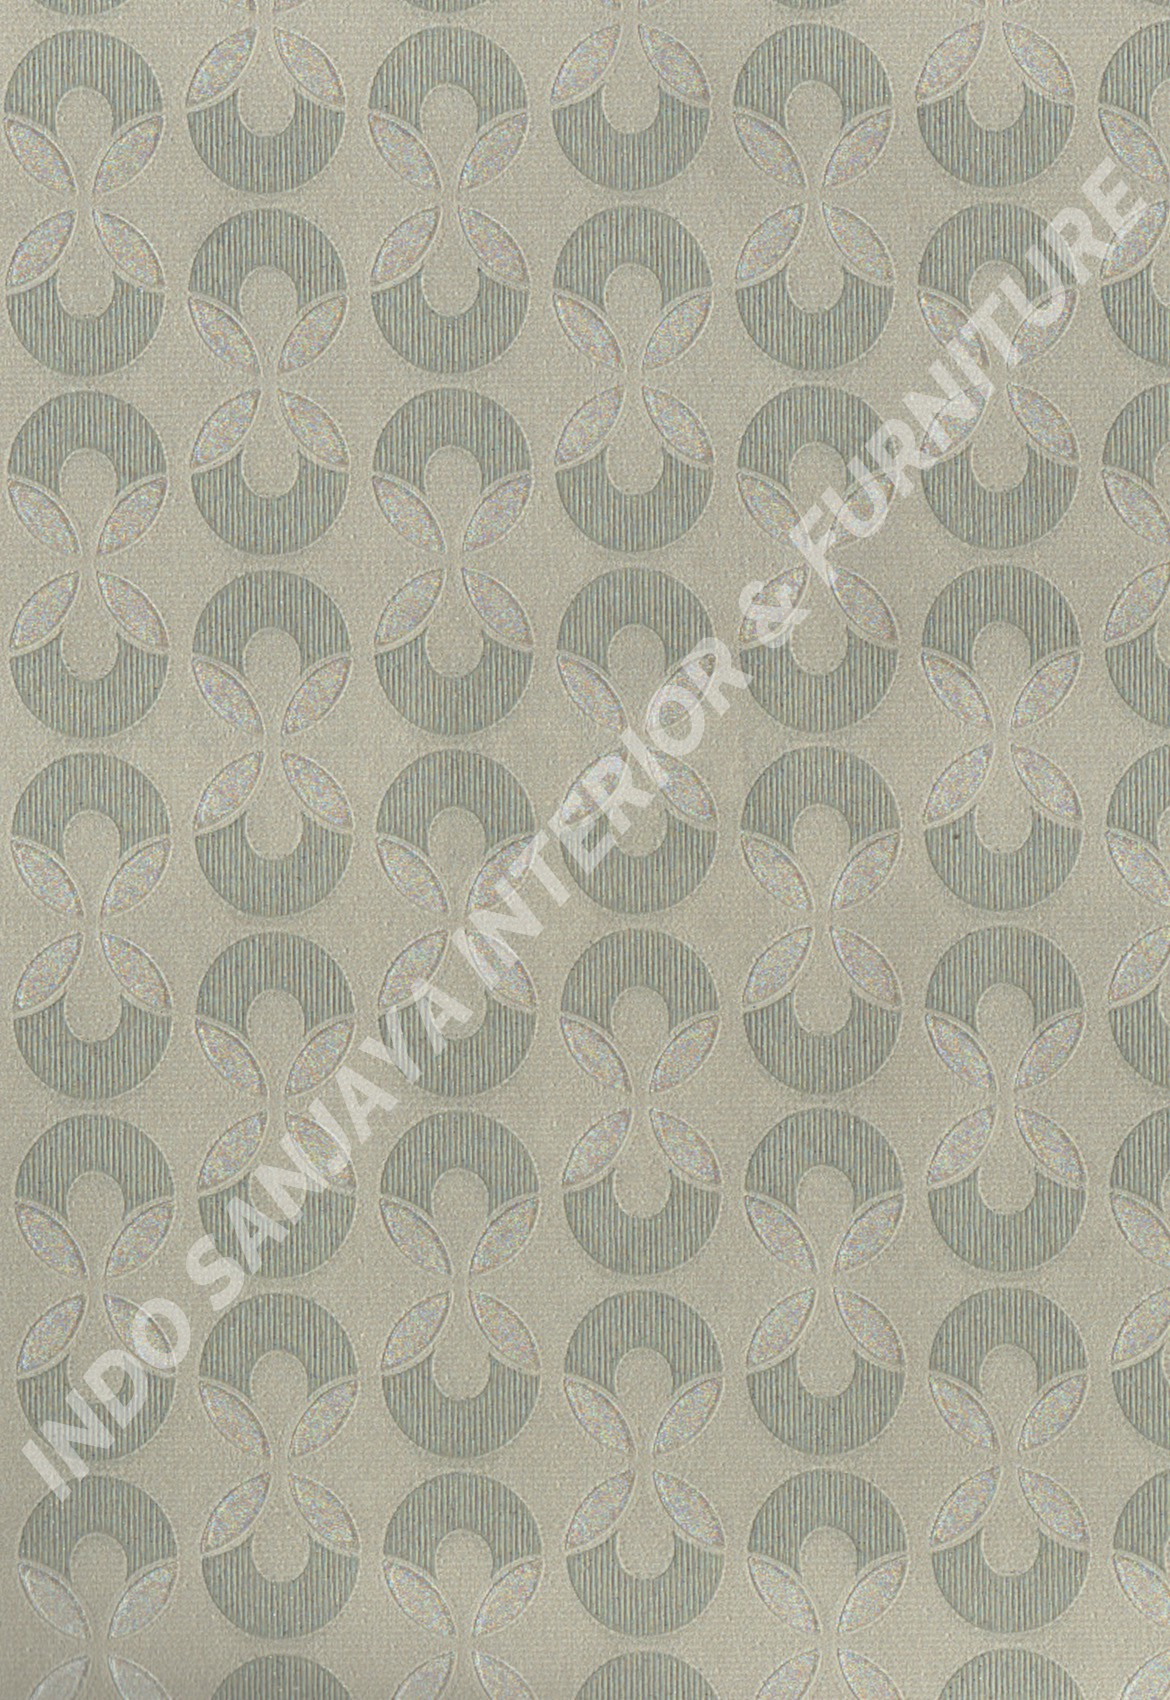 wallpaper   Wallpaper Minimalis Polos E11306:E11306 corak  warna